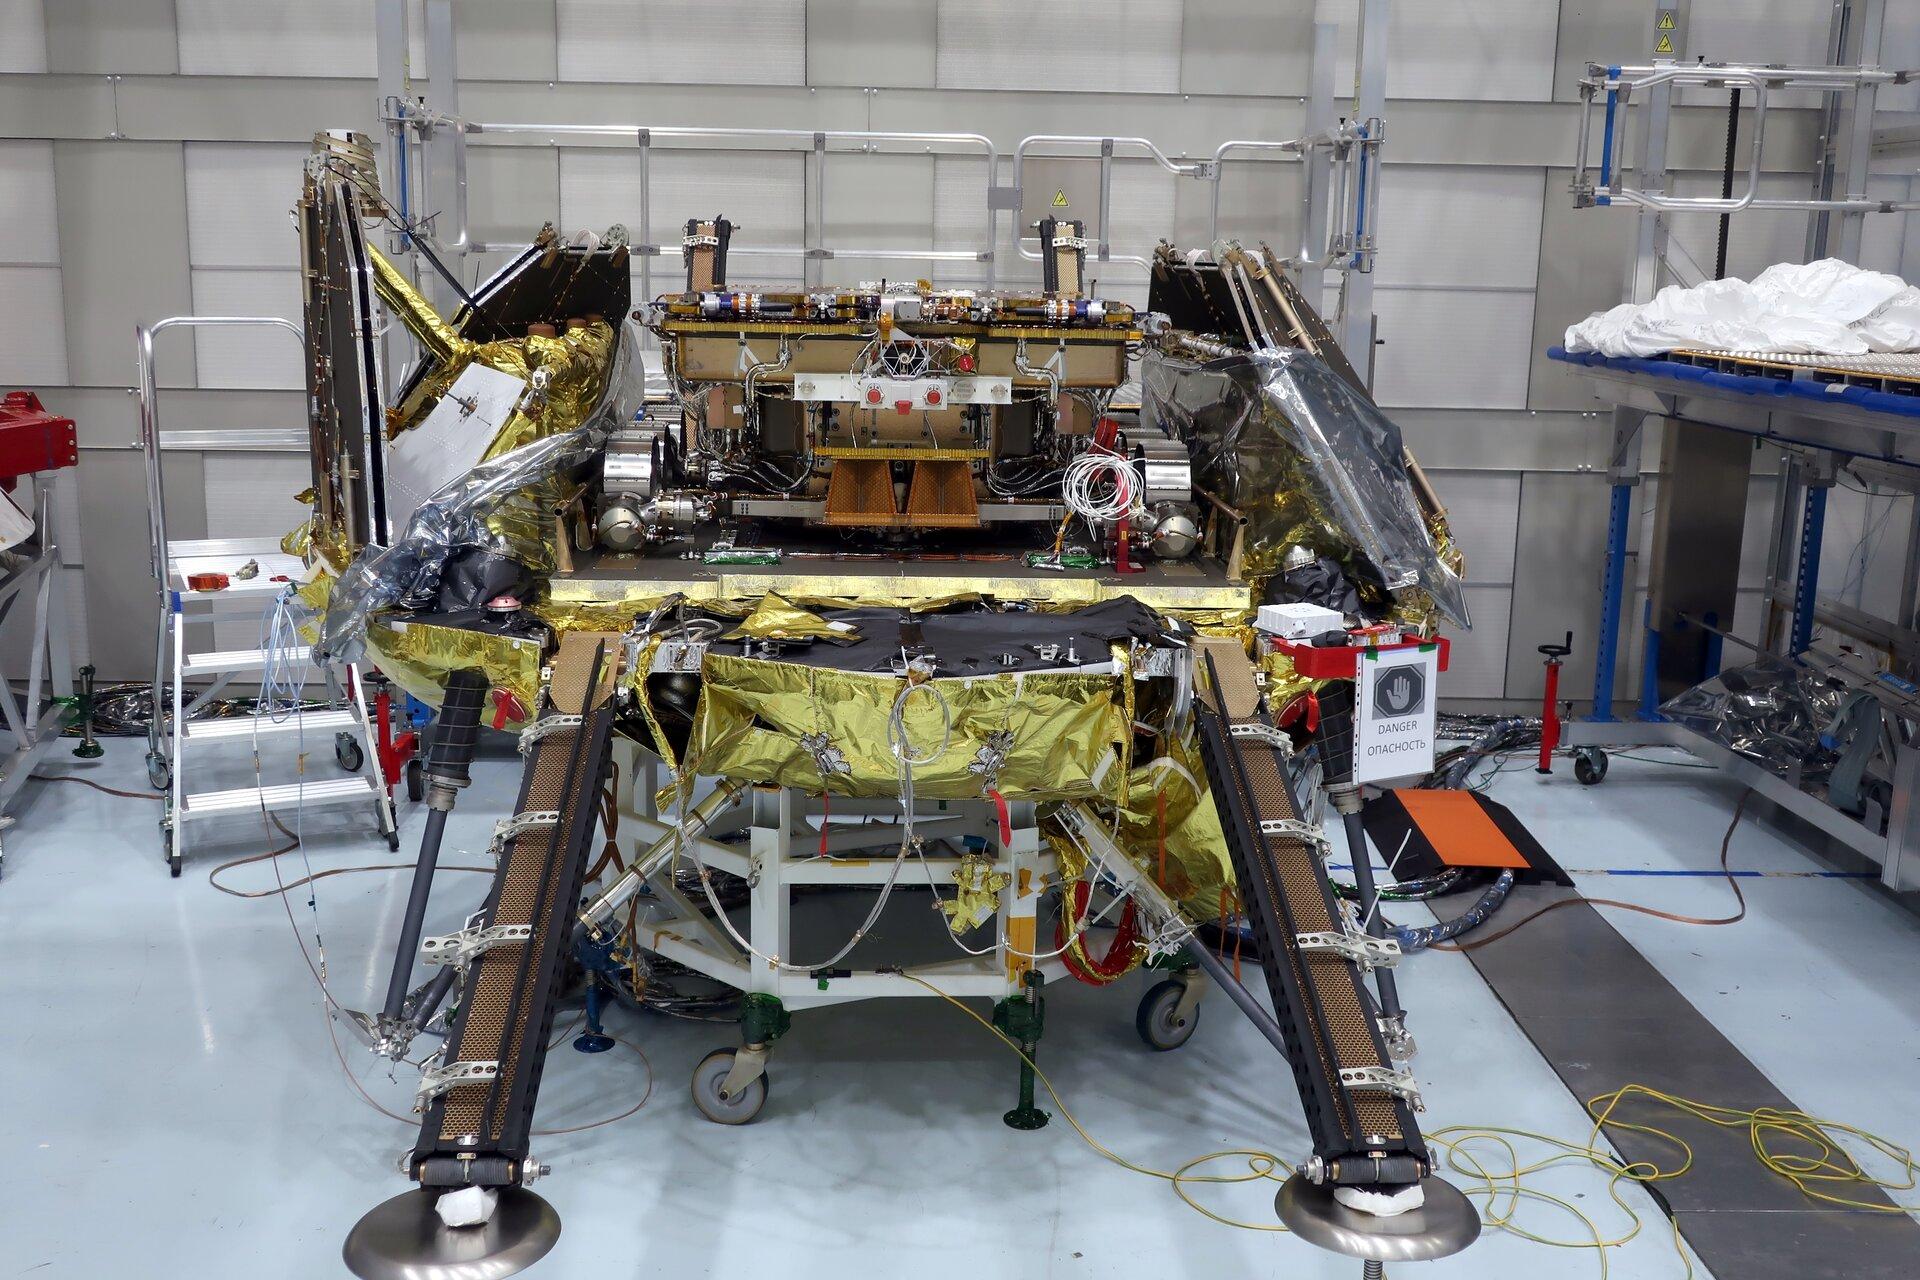 ExoMars - 2022 - Préparation de la mission (Rosalind Franklin) - Page 15 11648